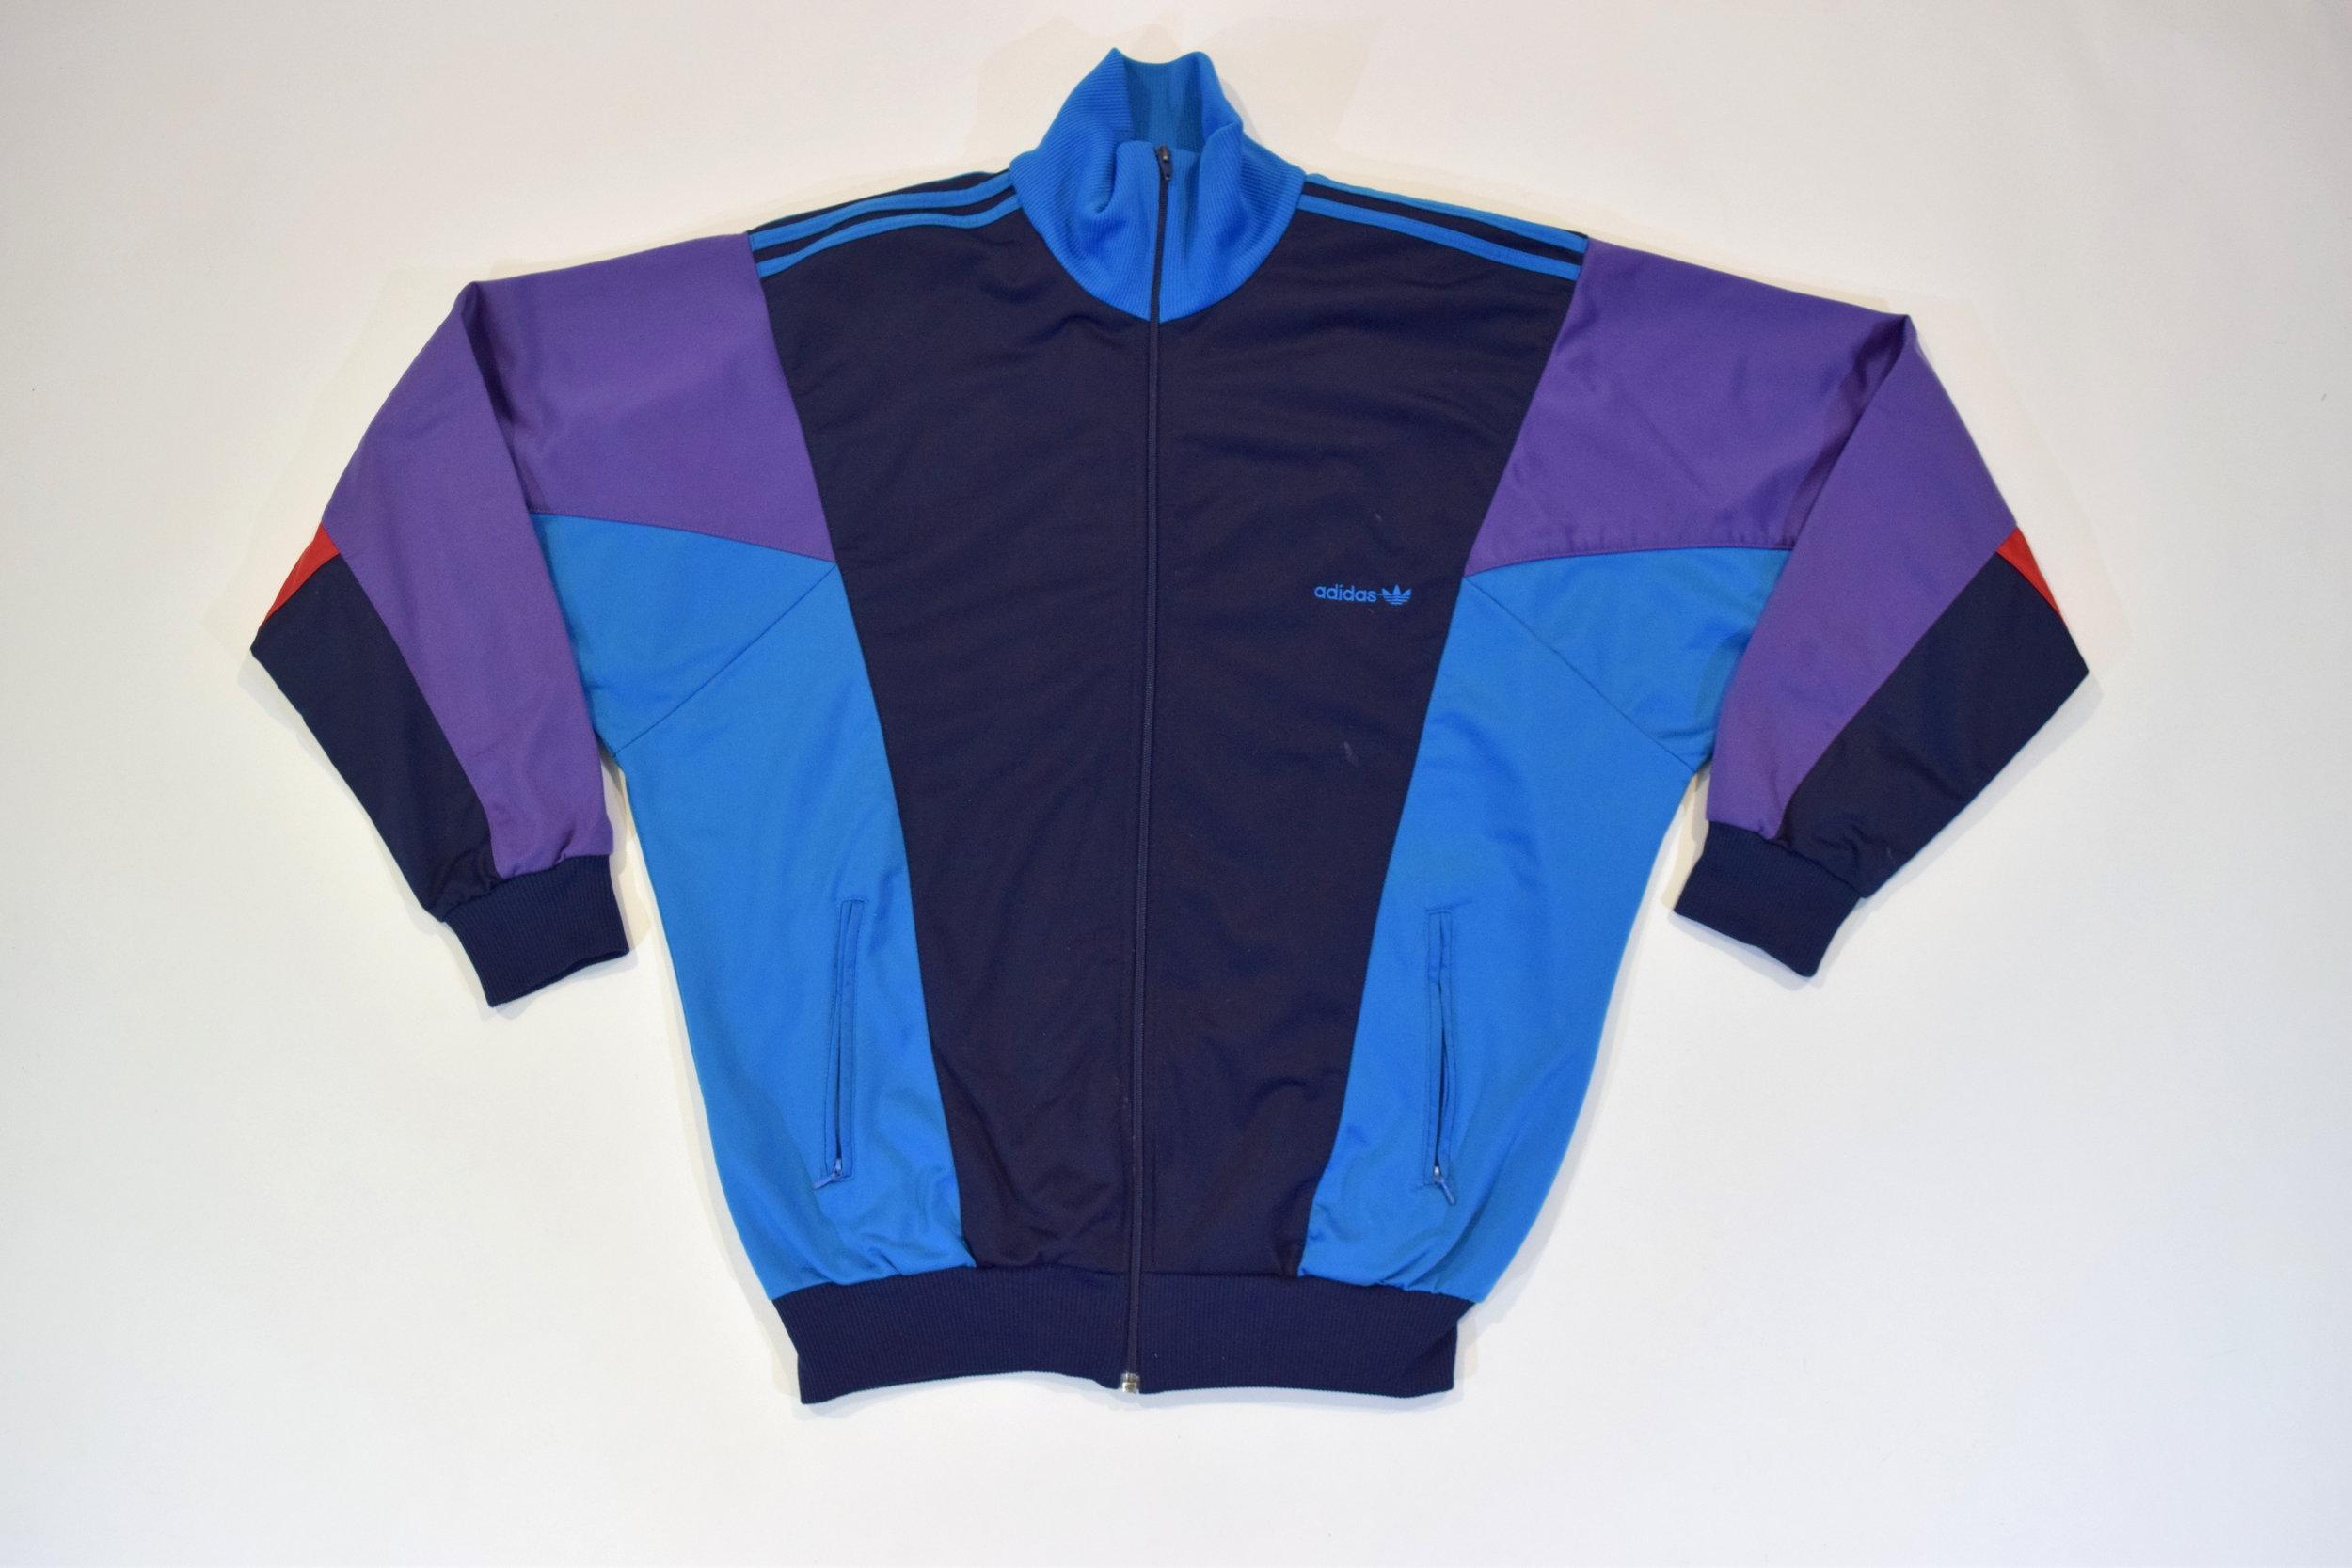 399dcaba7588 Blue Purple Adidas Originals 90s Tracksuit Top Jacket — Headlock Vintage